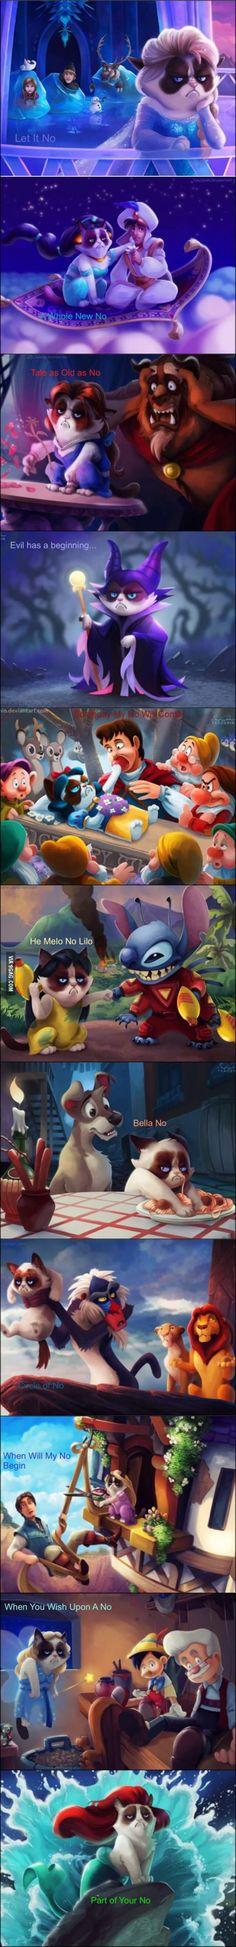 Grumpy Cat-Disney mashup- The Pinnochio one though. OMG.